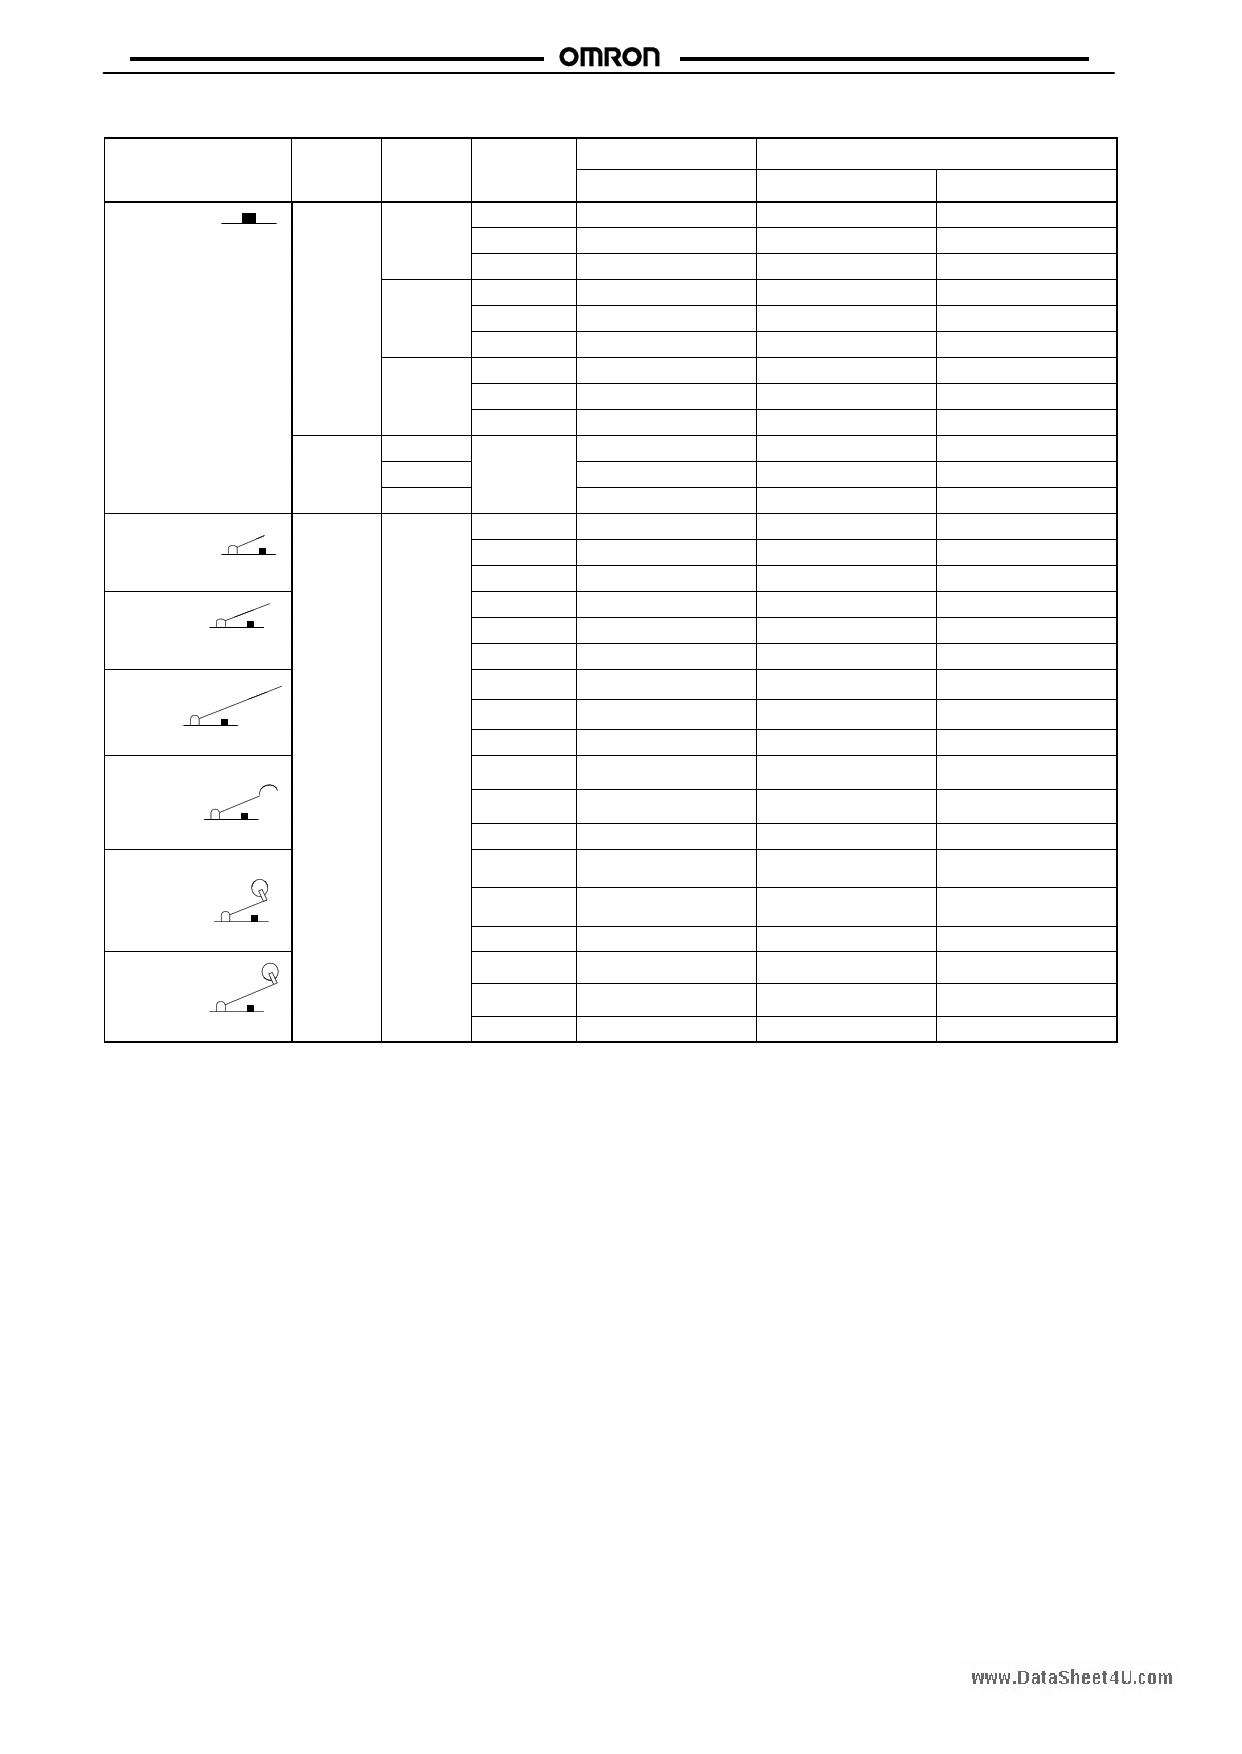 V-112-1A4 pdf